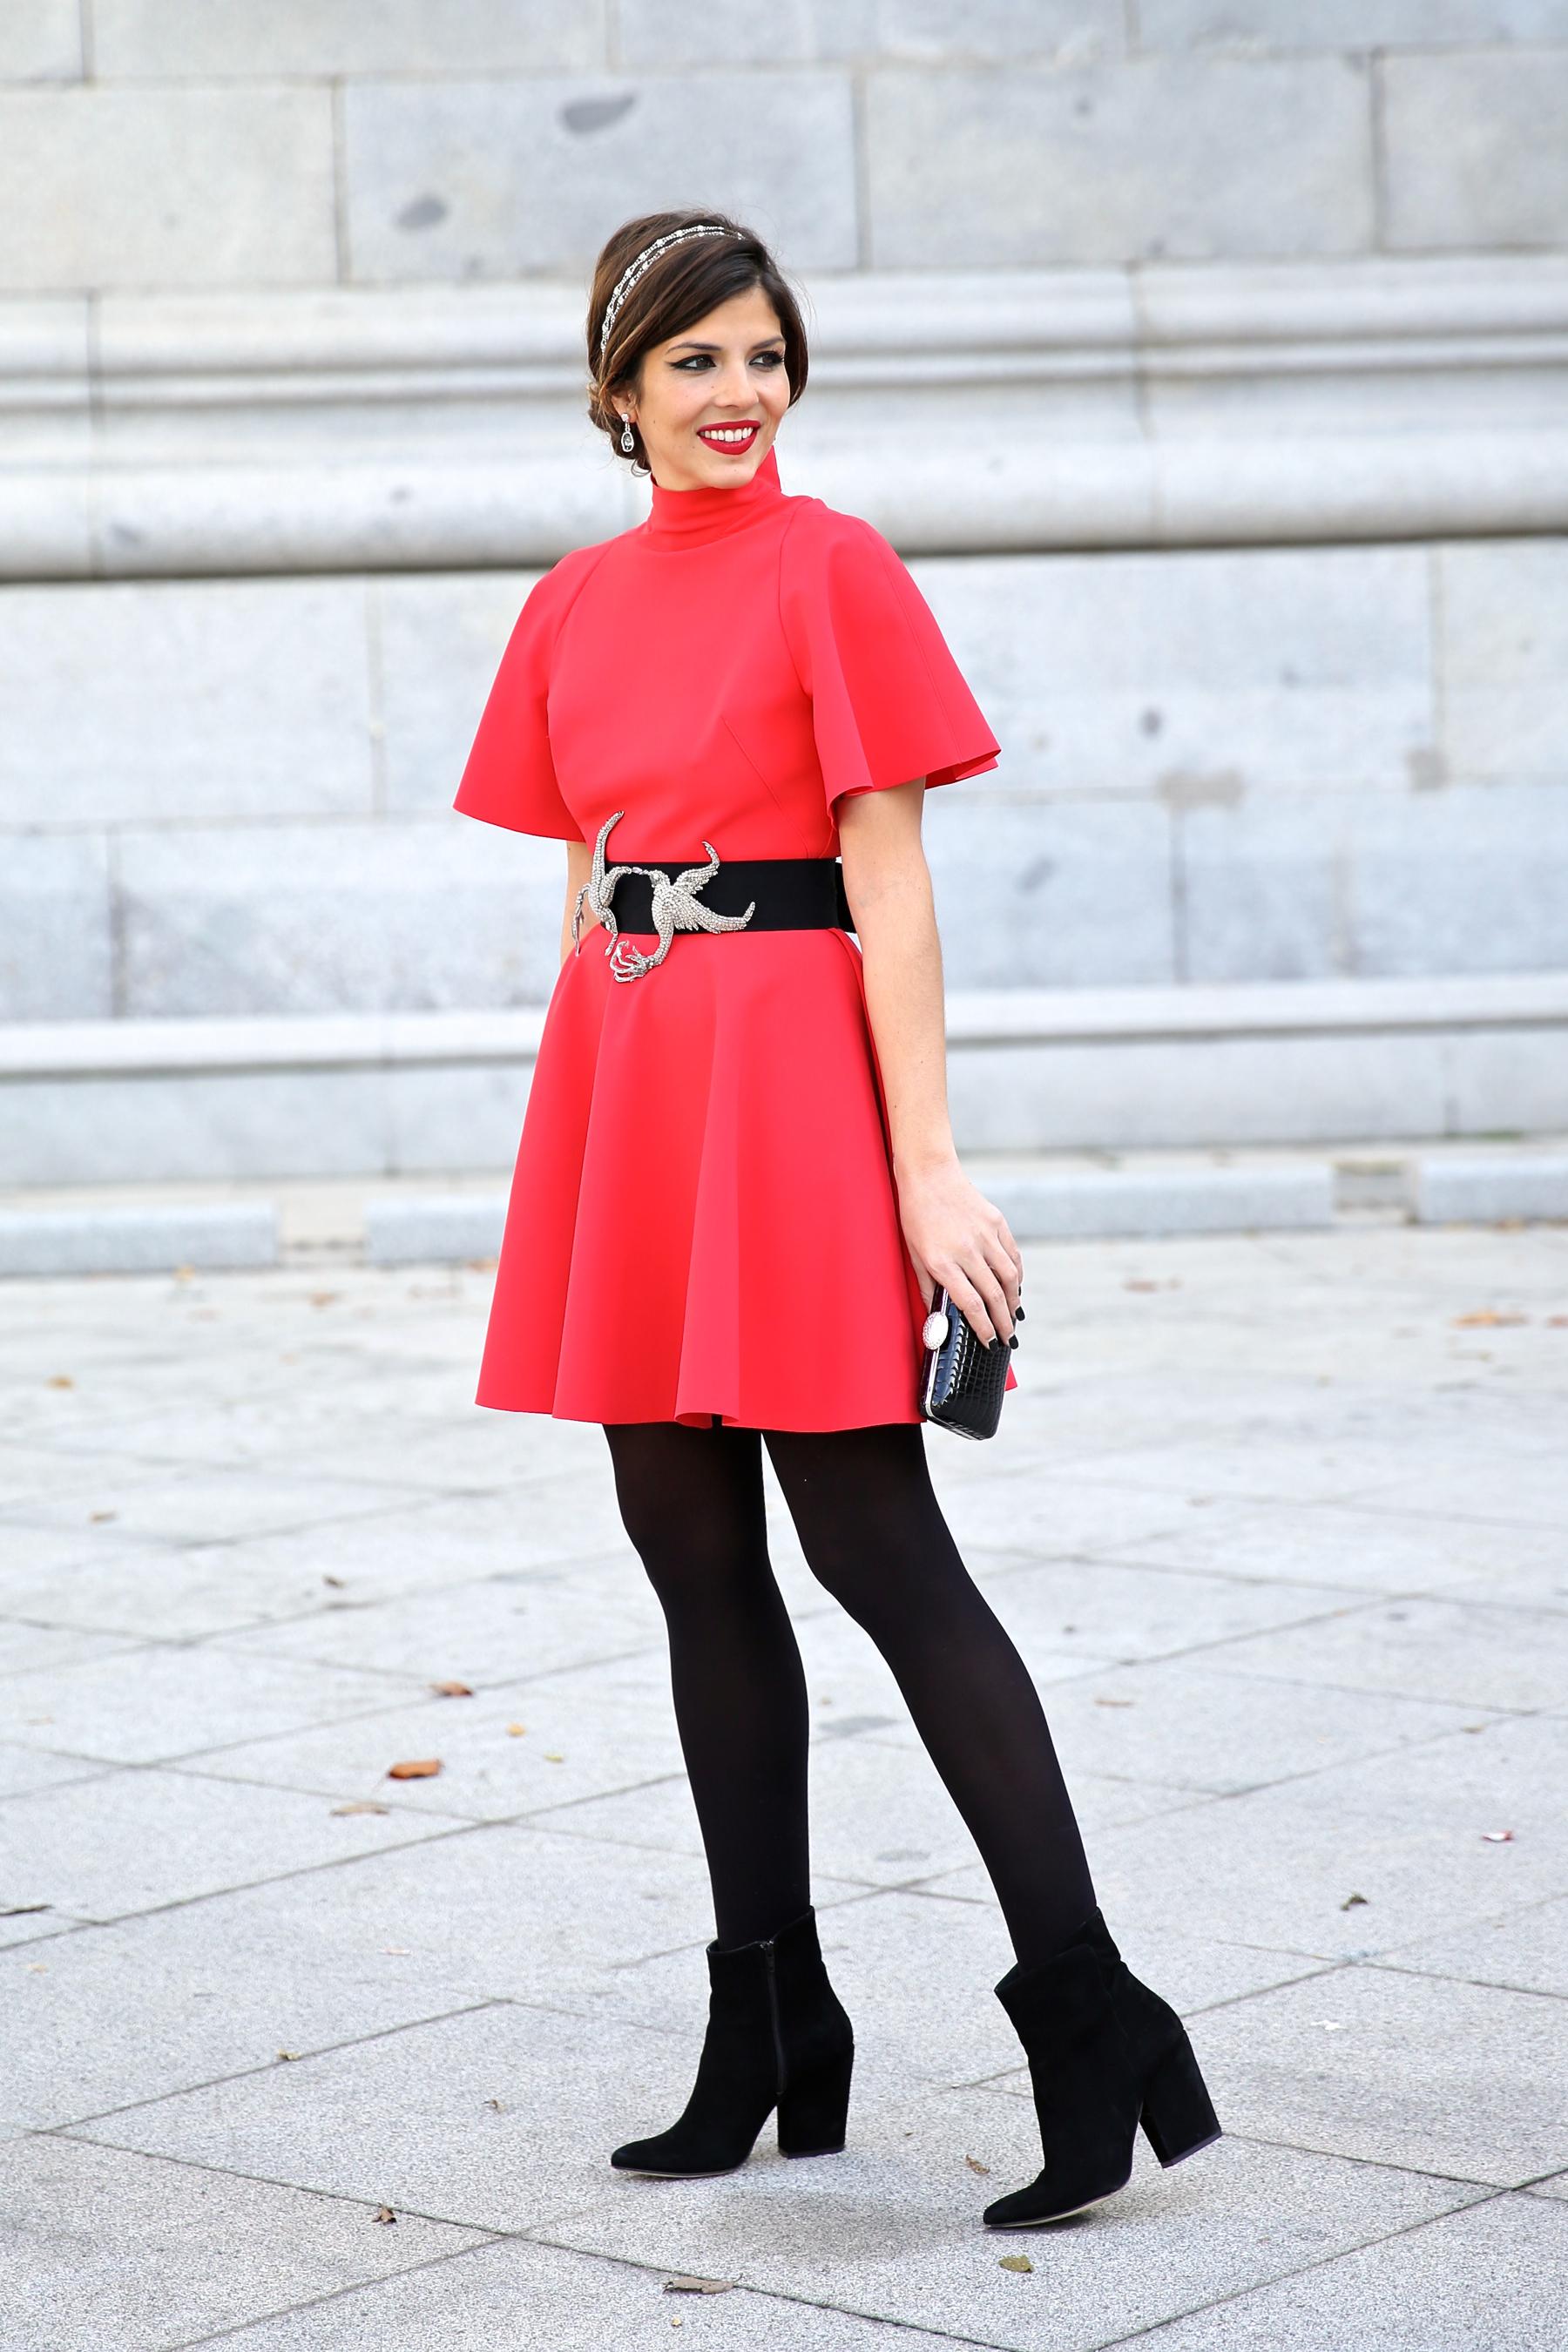 trendy_taste-look-outfit-street_style-ootd-blog-blogger-fashion_spain-moda_españa-vestido_fiesta-24fab-16